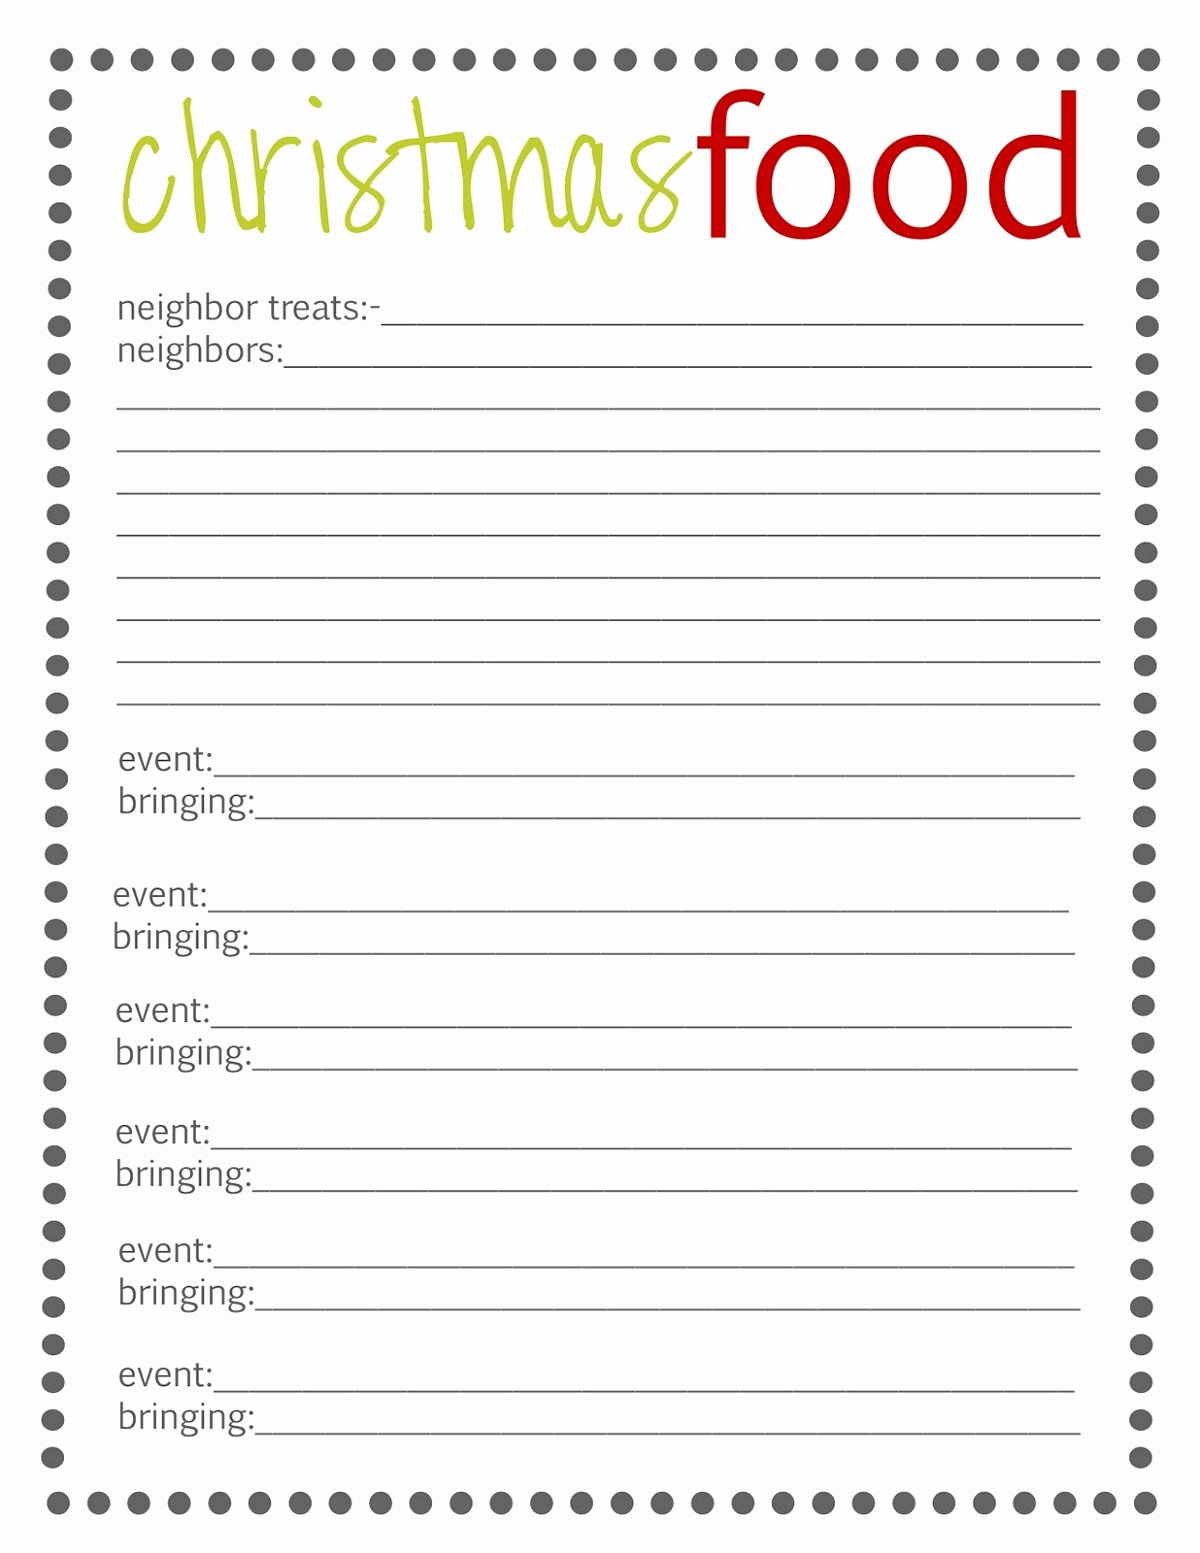 Christmas Potluck Sign Up Sheet Inspirational Holiday Sign Up Sheet Templates Free